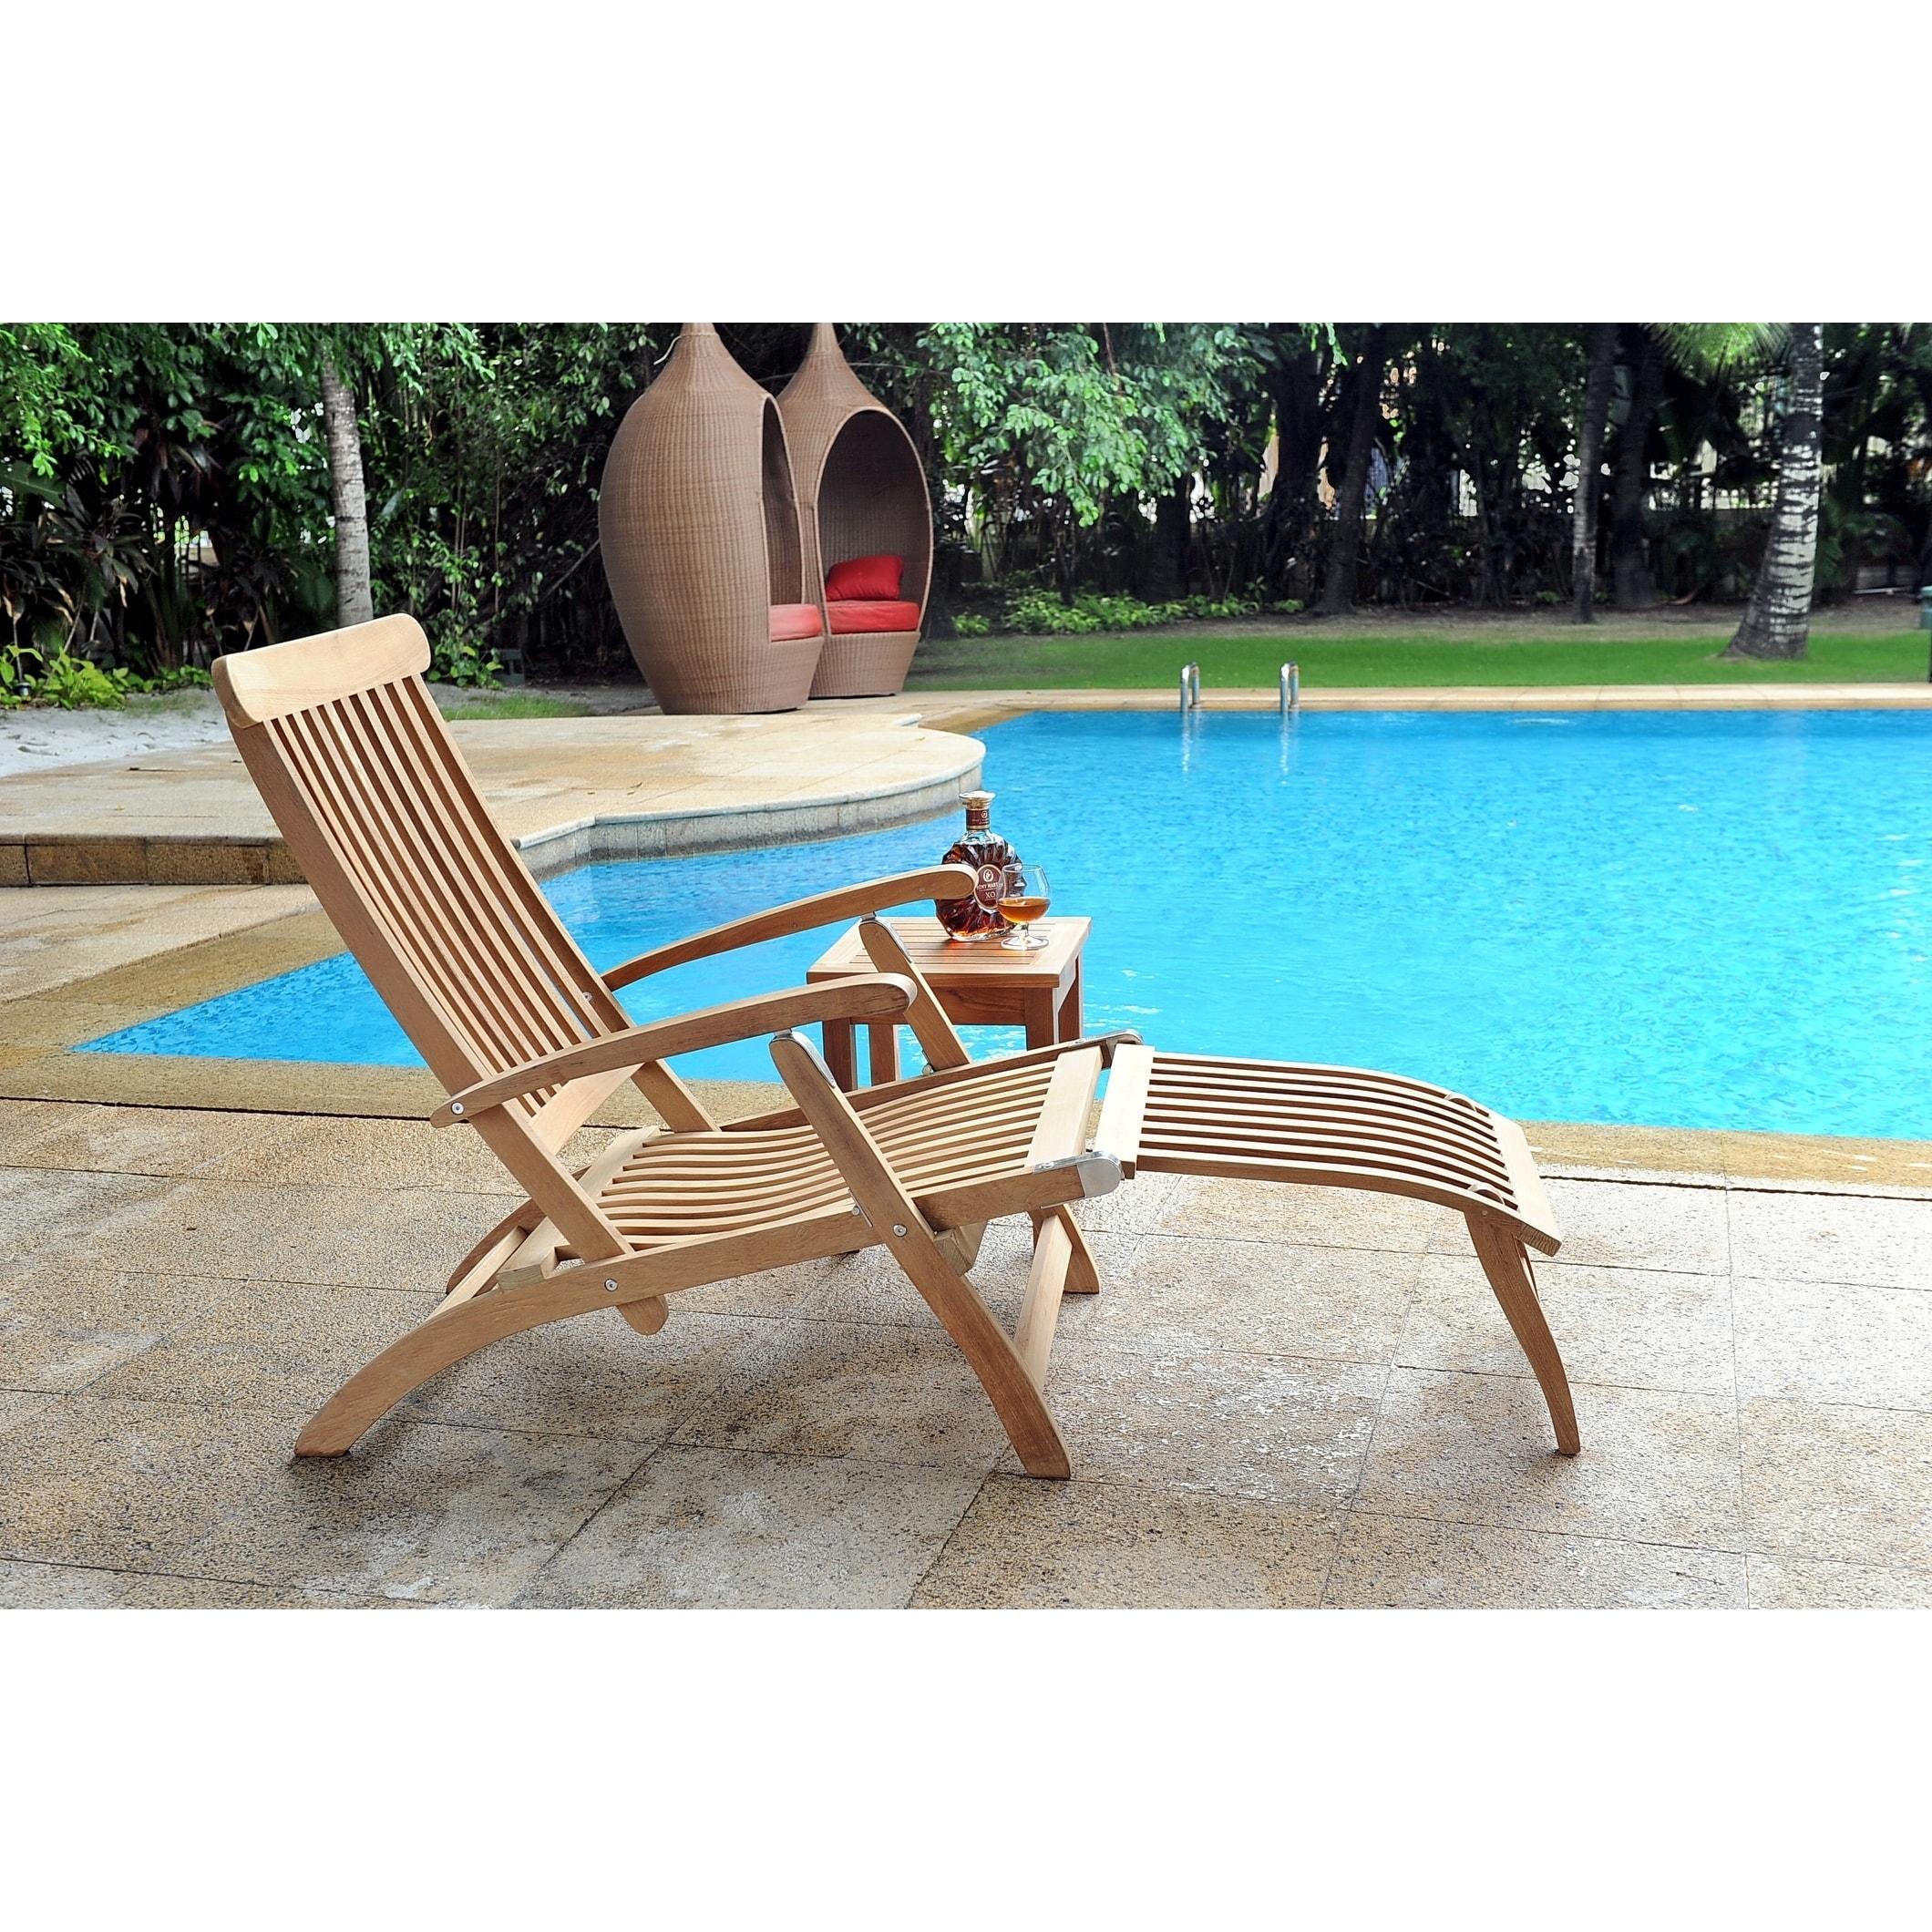 HiTeak Steamer Outdoor Folding Teak Chaise Lounge Chair